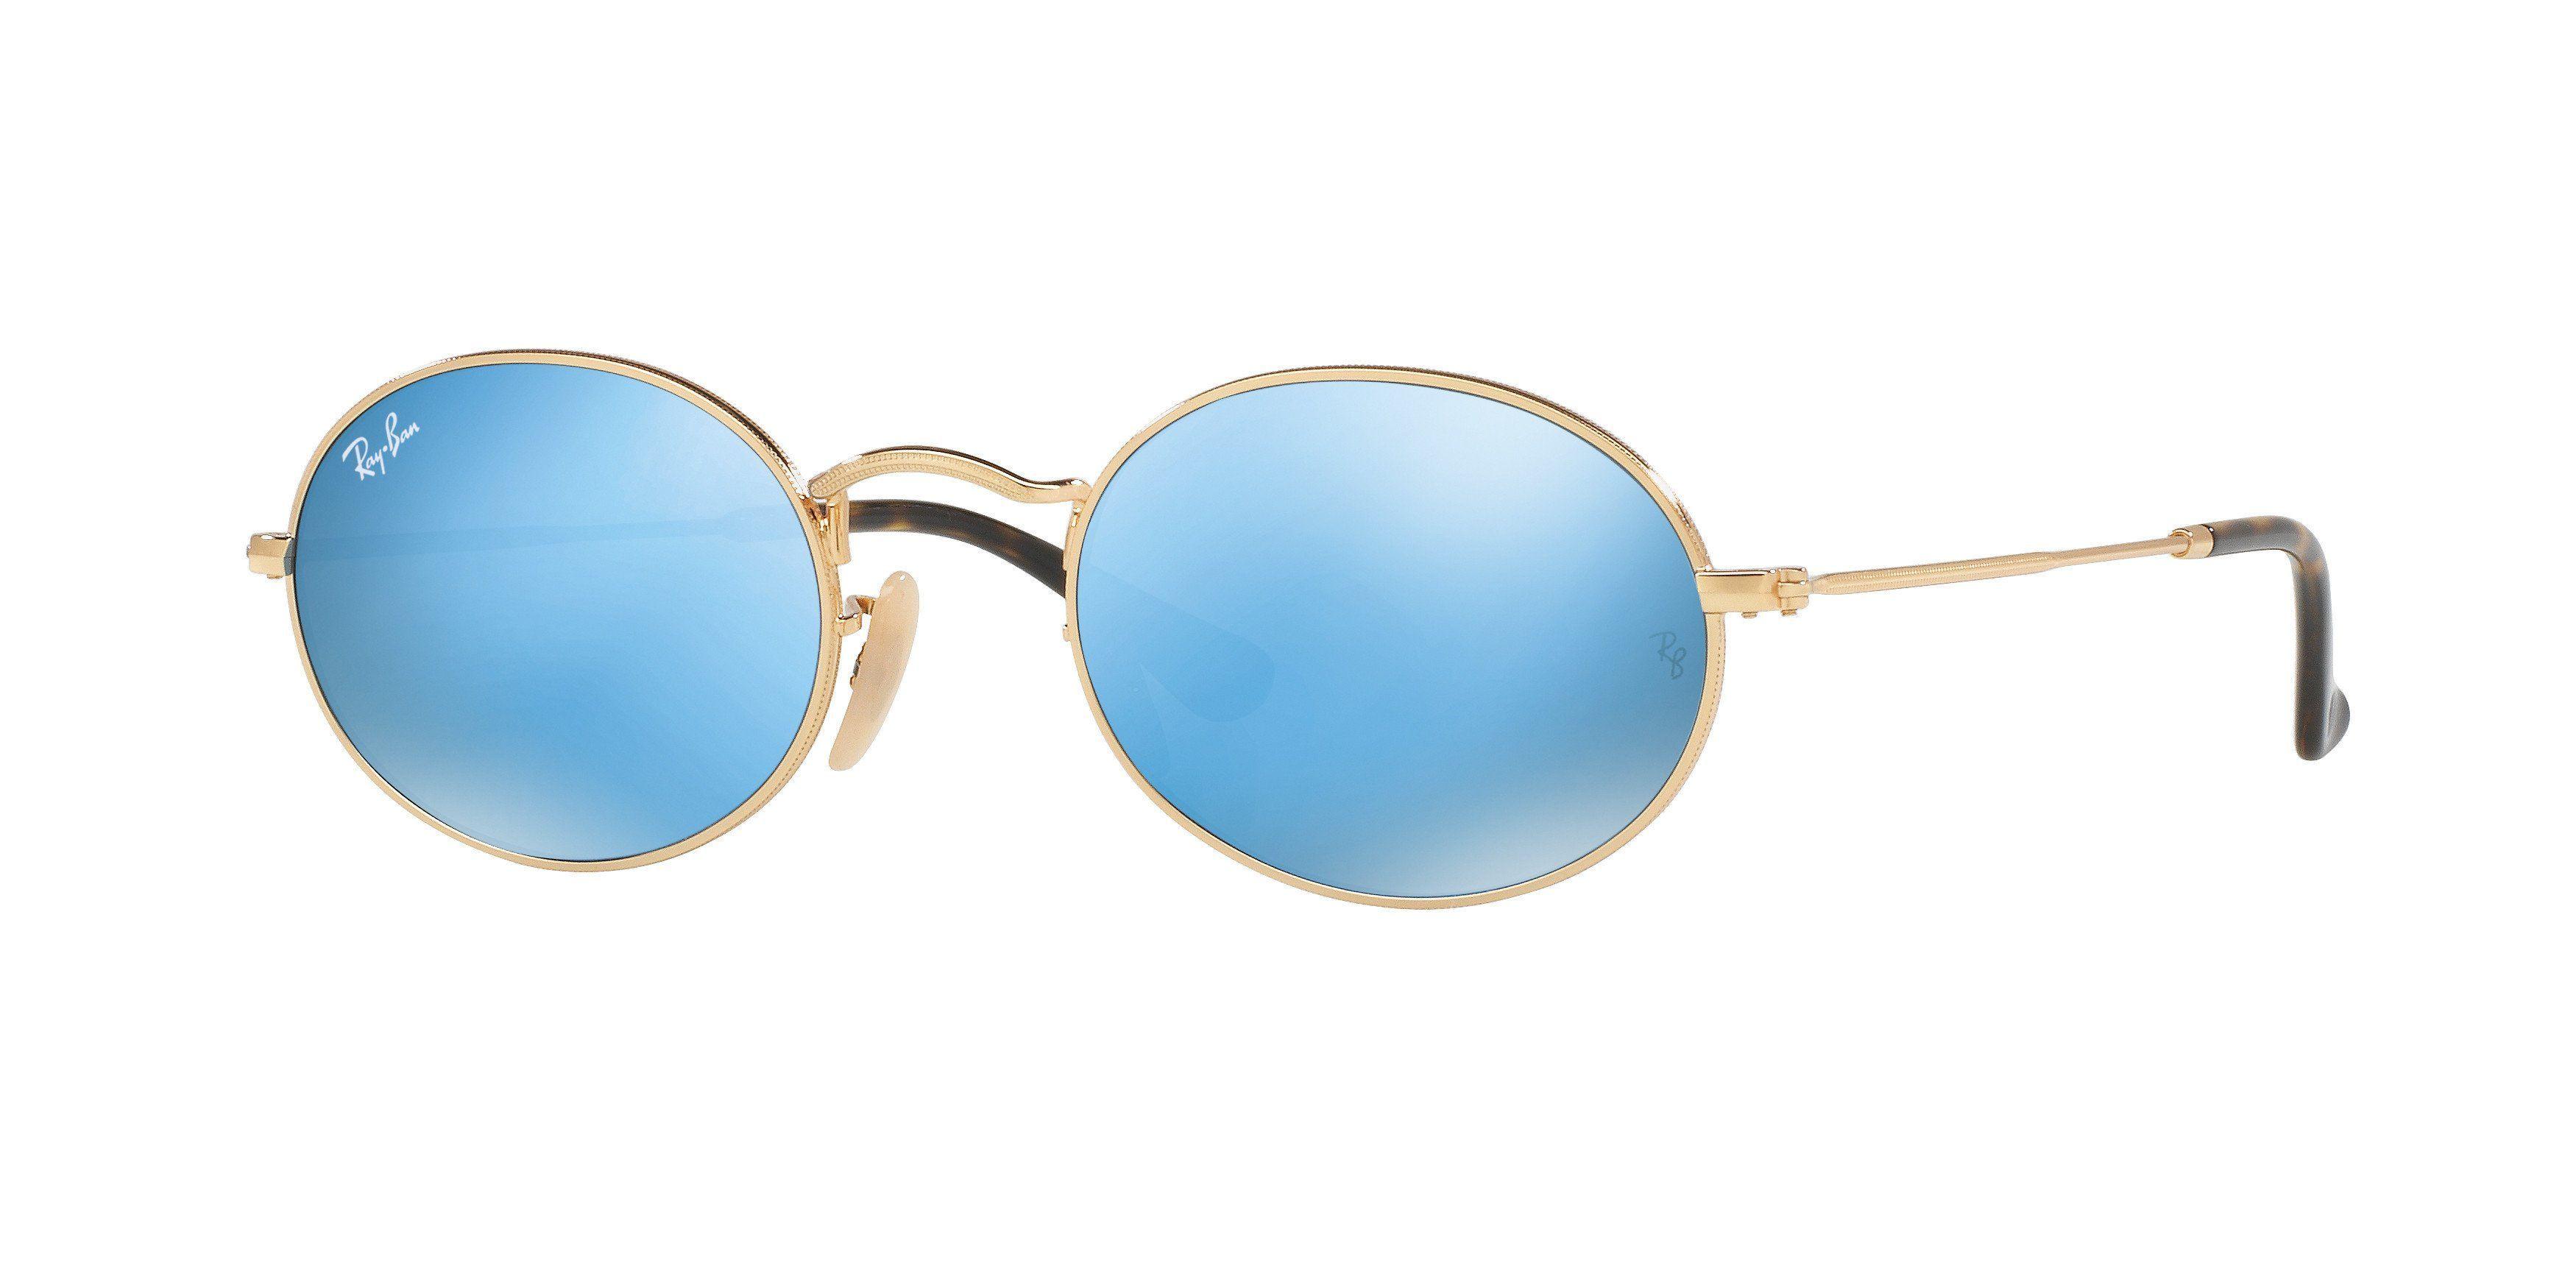 3b5501b9d2 Ray-Ban RB3547N Sunglasses | Sunglasses | Oval sunglasses, Ray ban ...